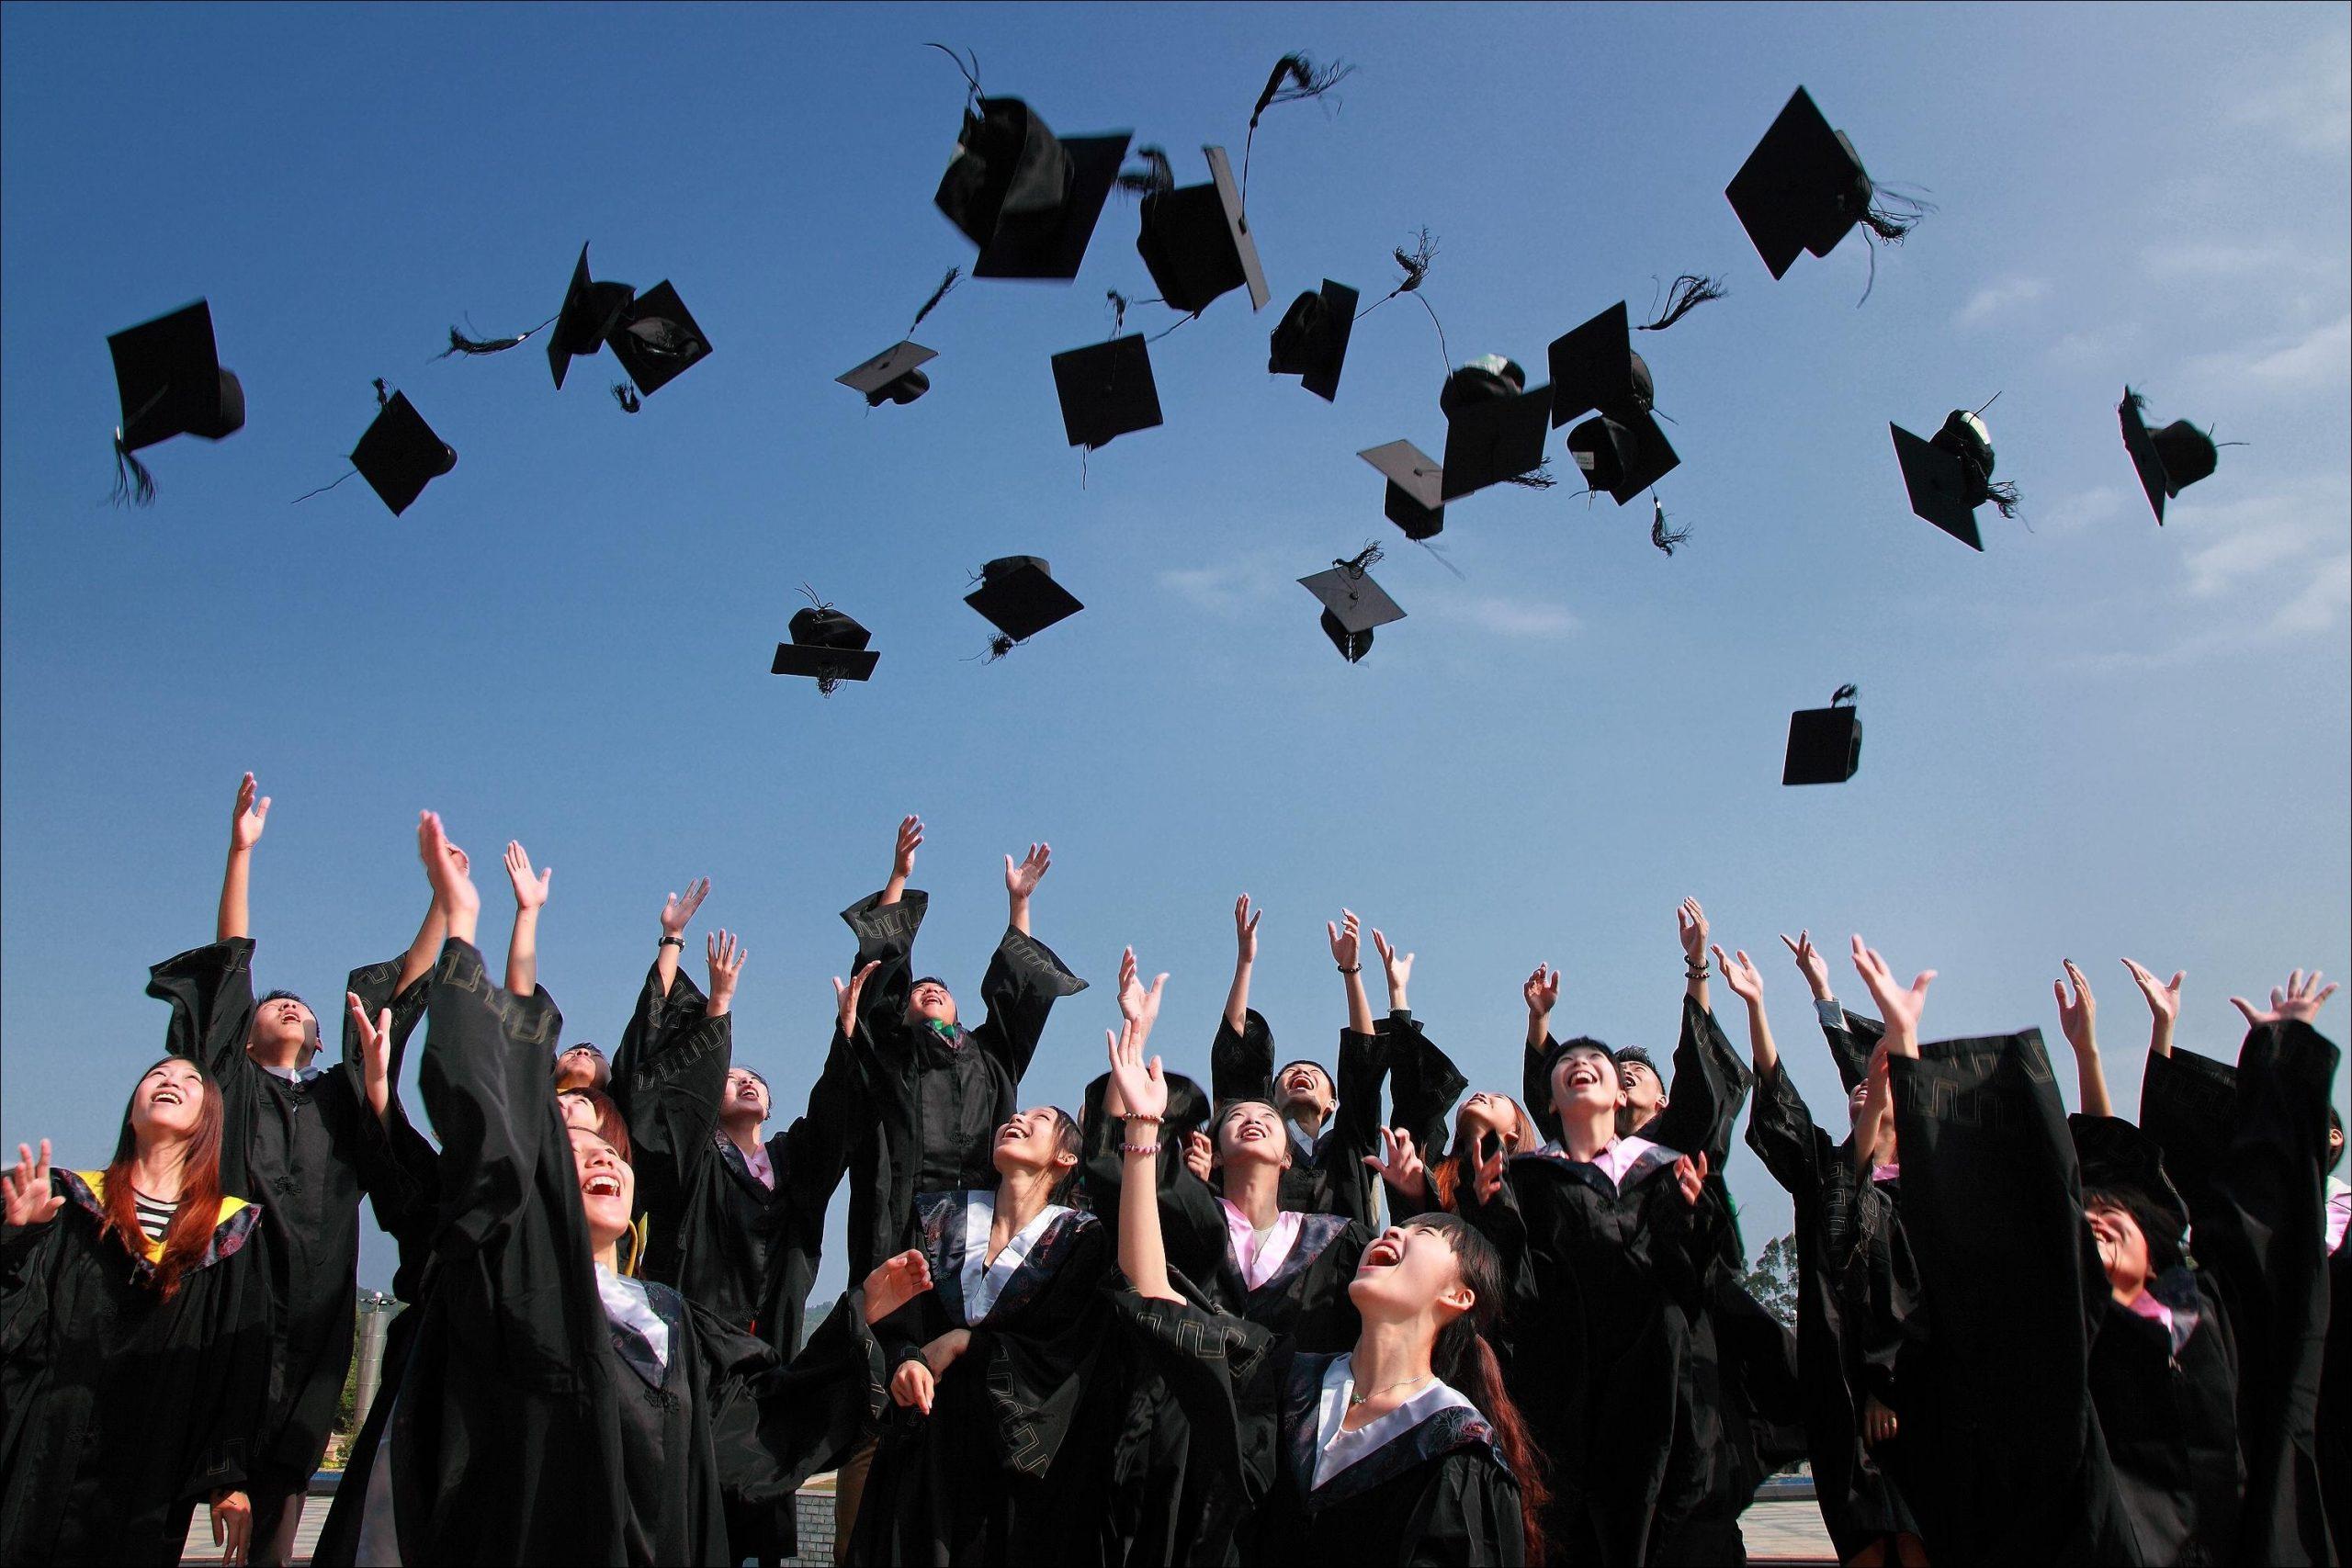 Class of 2021 Graduates' Post High School Plans